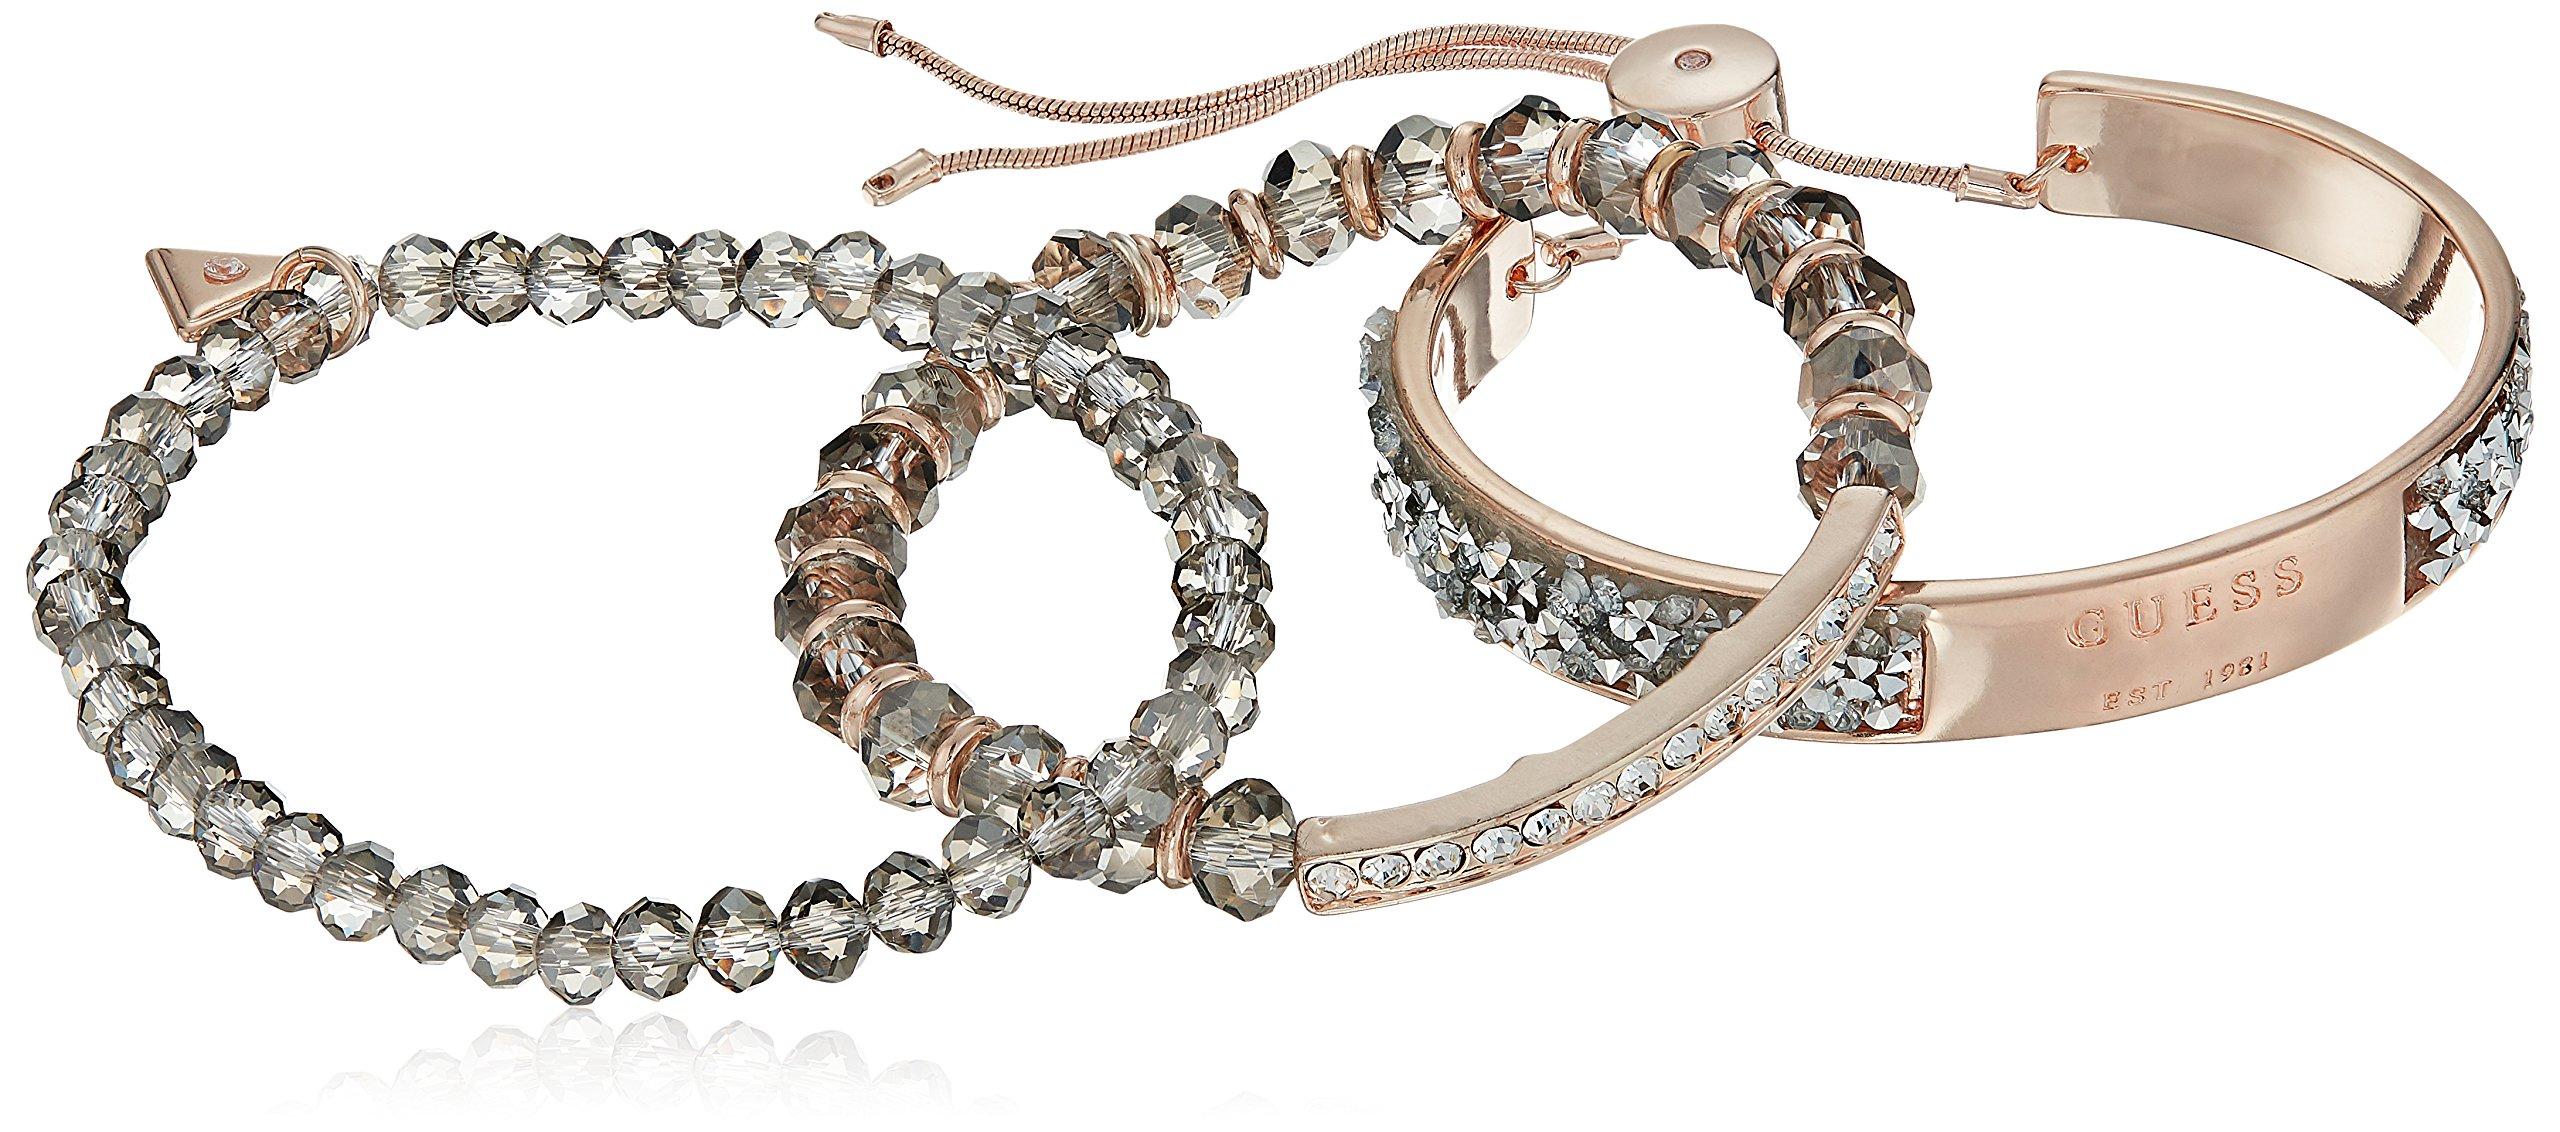 GUESS Bracelet Items Women's 3Pc Bracelet Set W Stones, Rose Gold, One Size